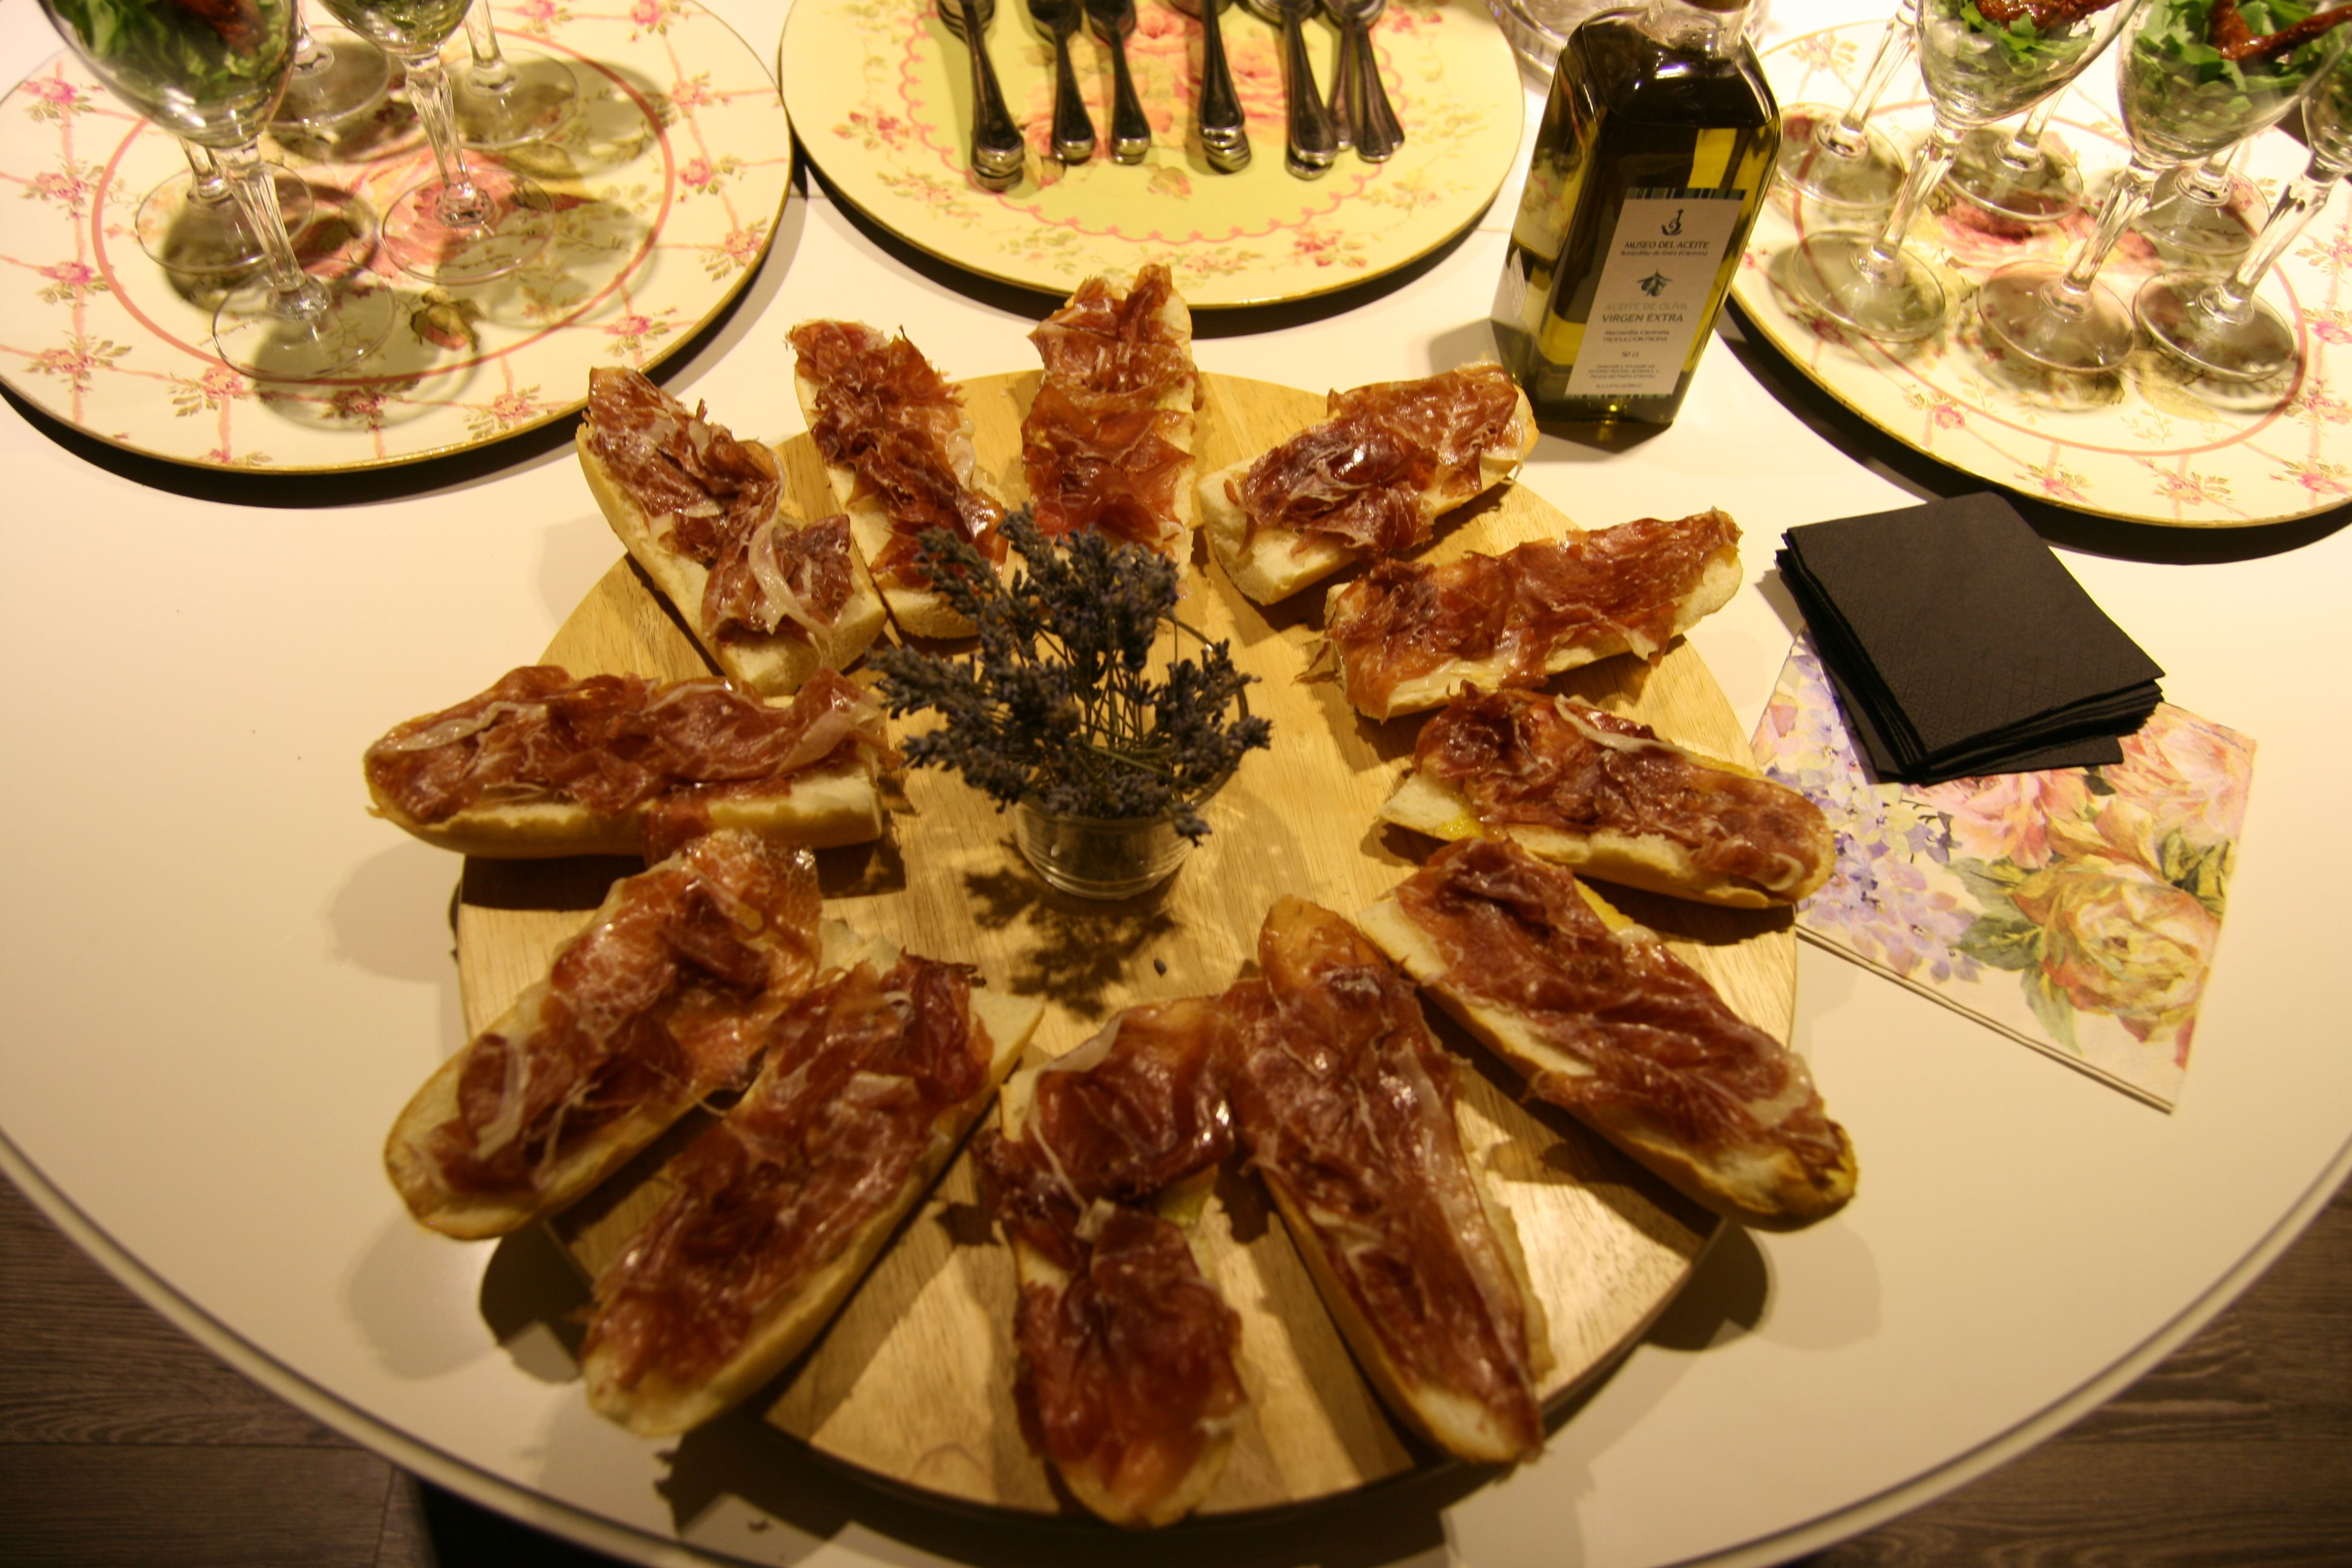 Canapés de jamón ibérico con aceite de albahaca